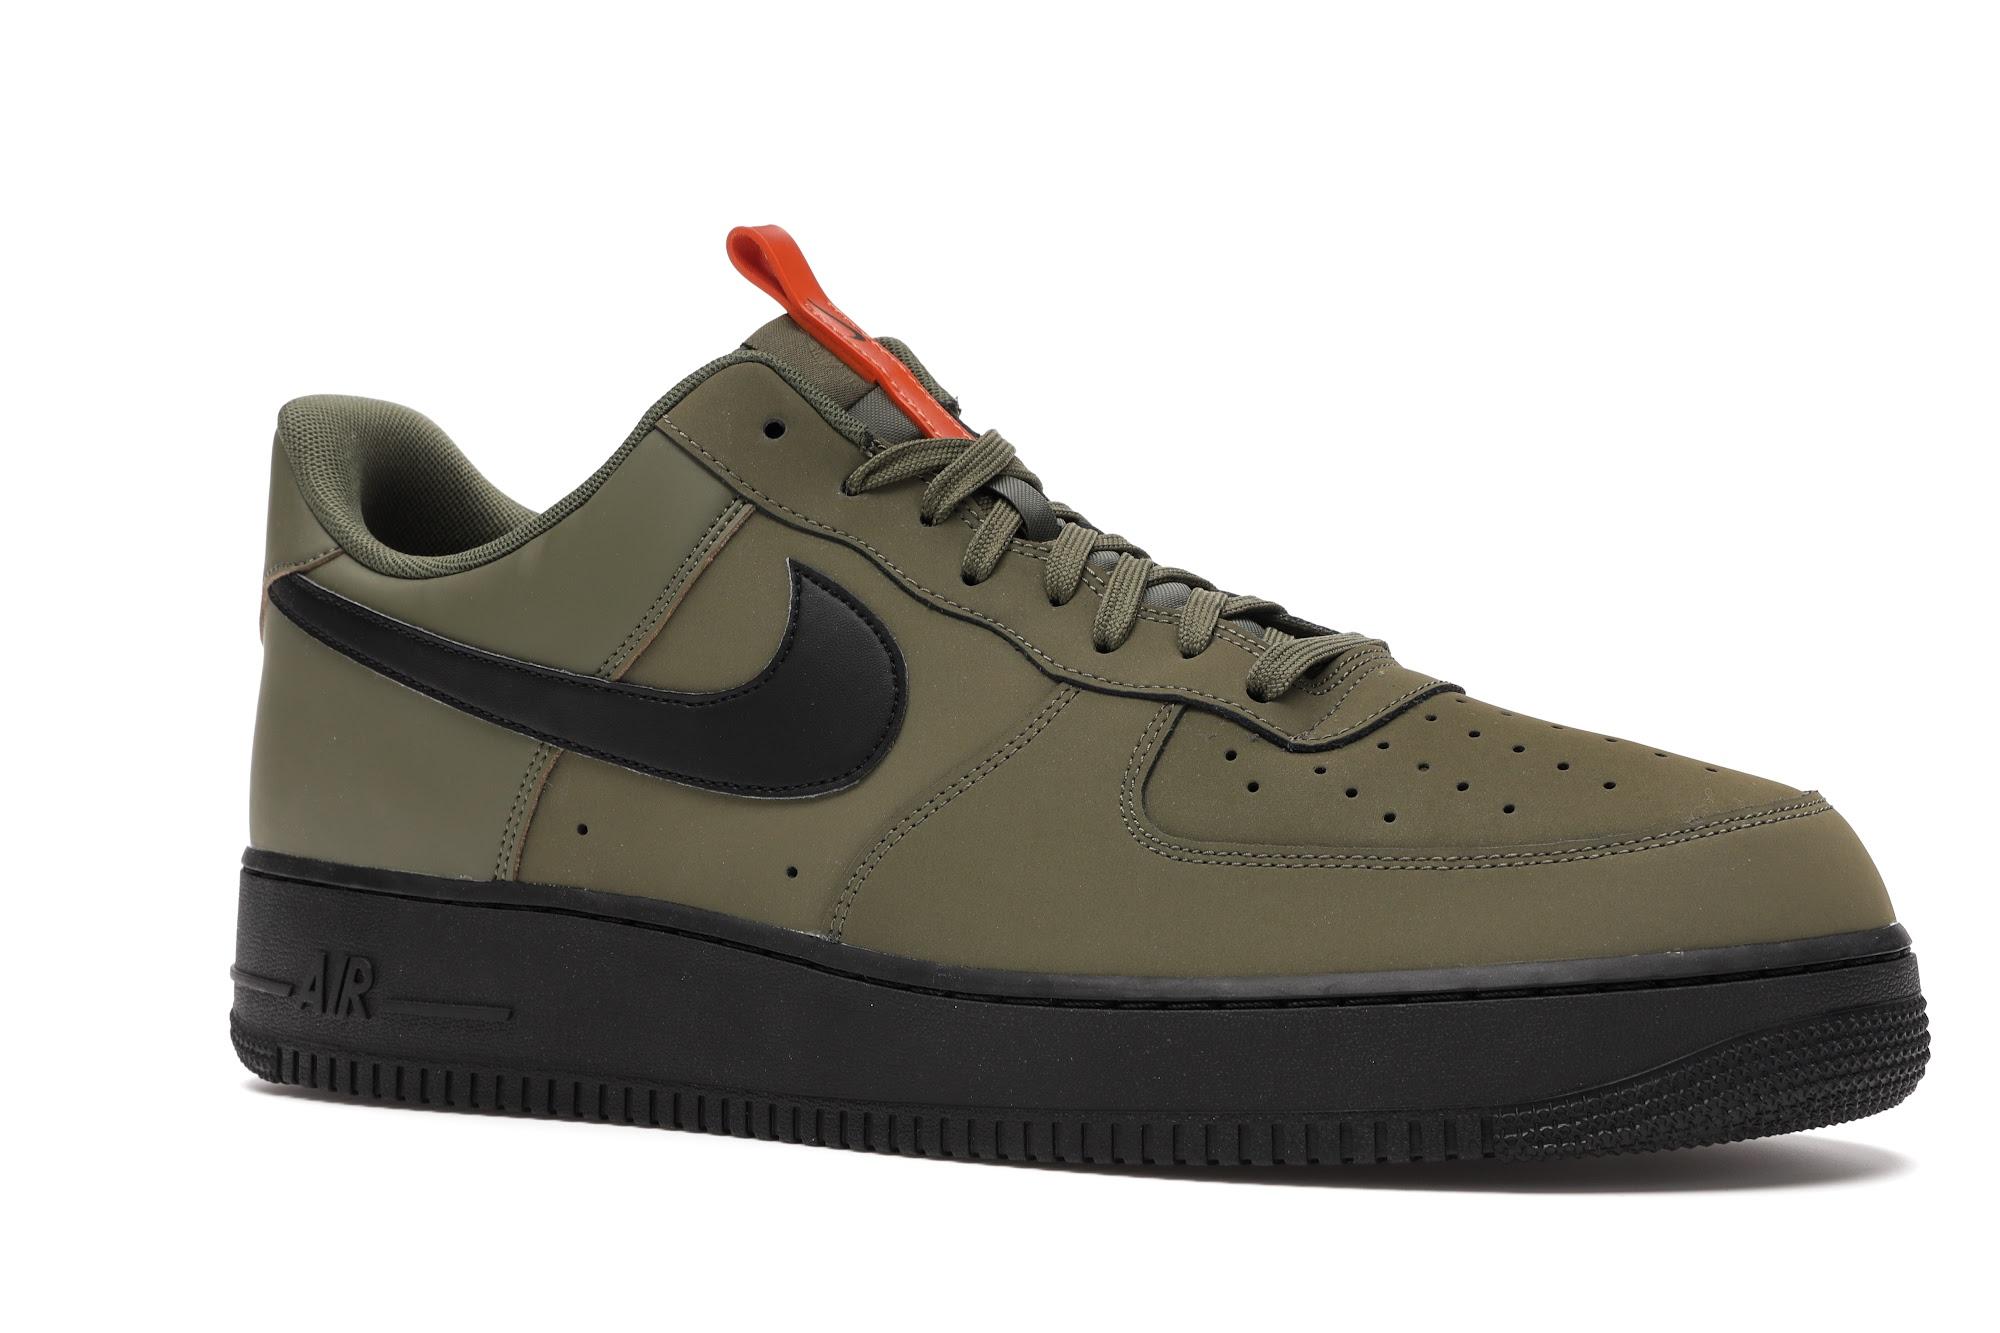 Nike Air Force 1 Low Medium Olive - BQ4326-200